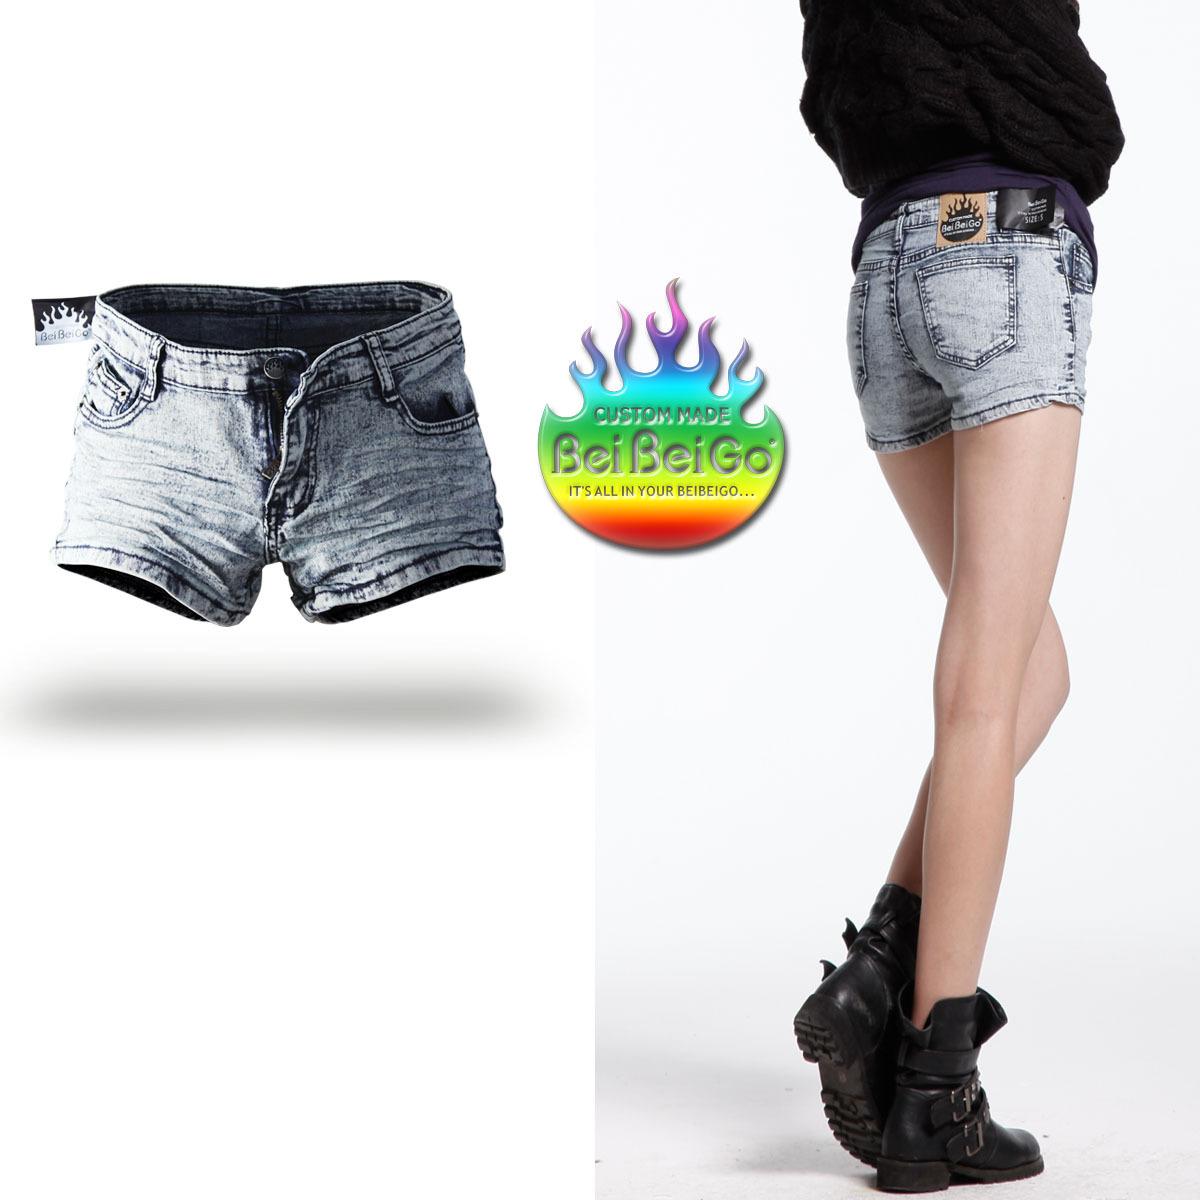 New Arrival Beibeigo 2012 bag pp pleated vintage white elastic slim denim shorts free shipping wholesale